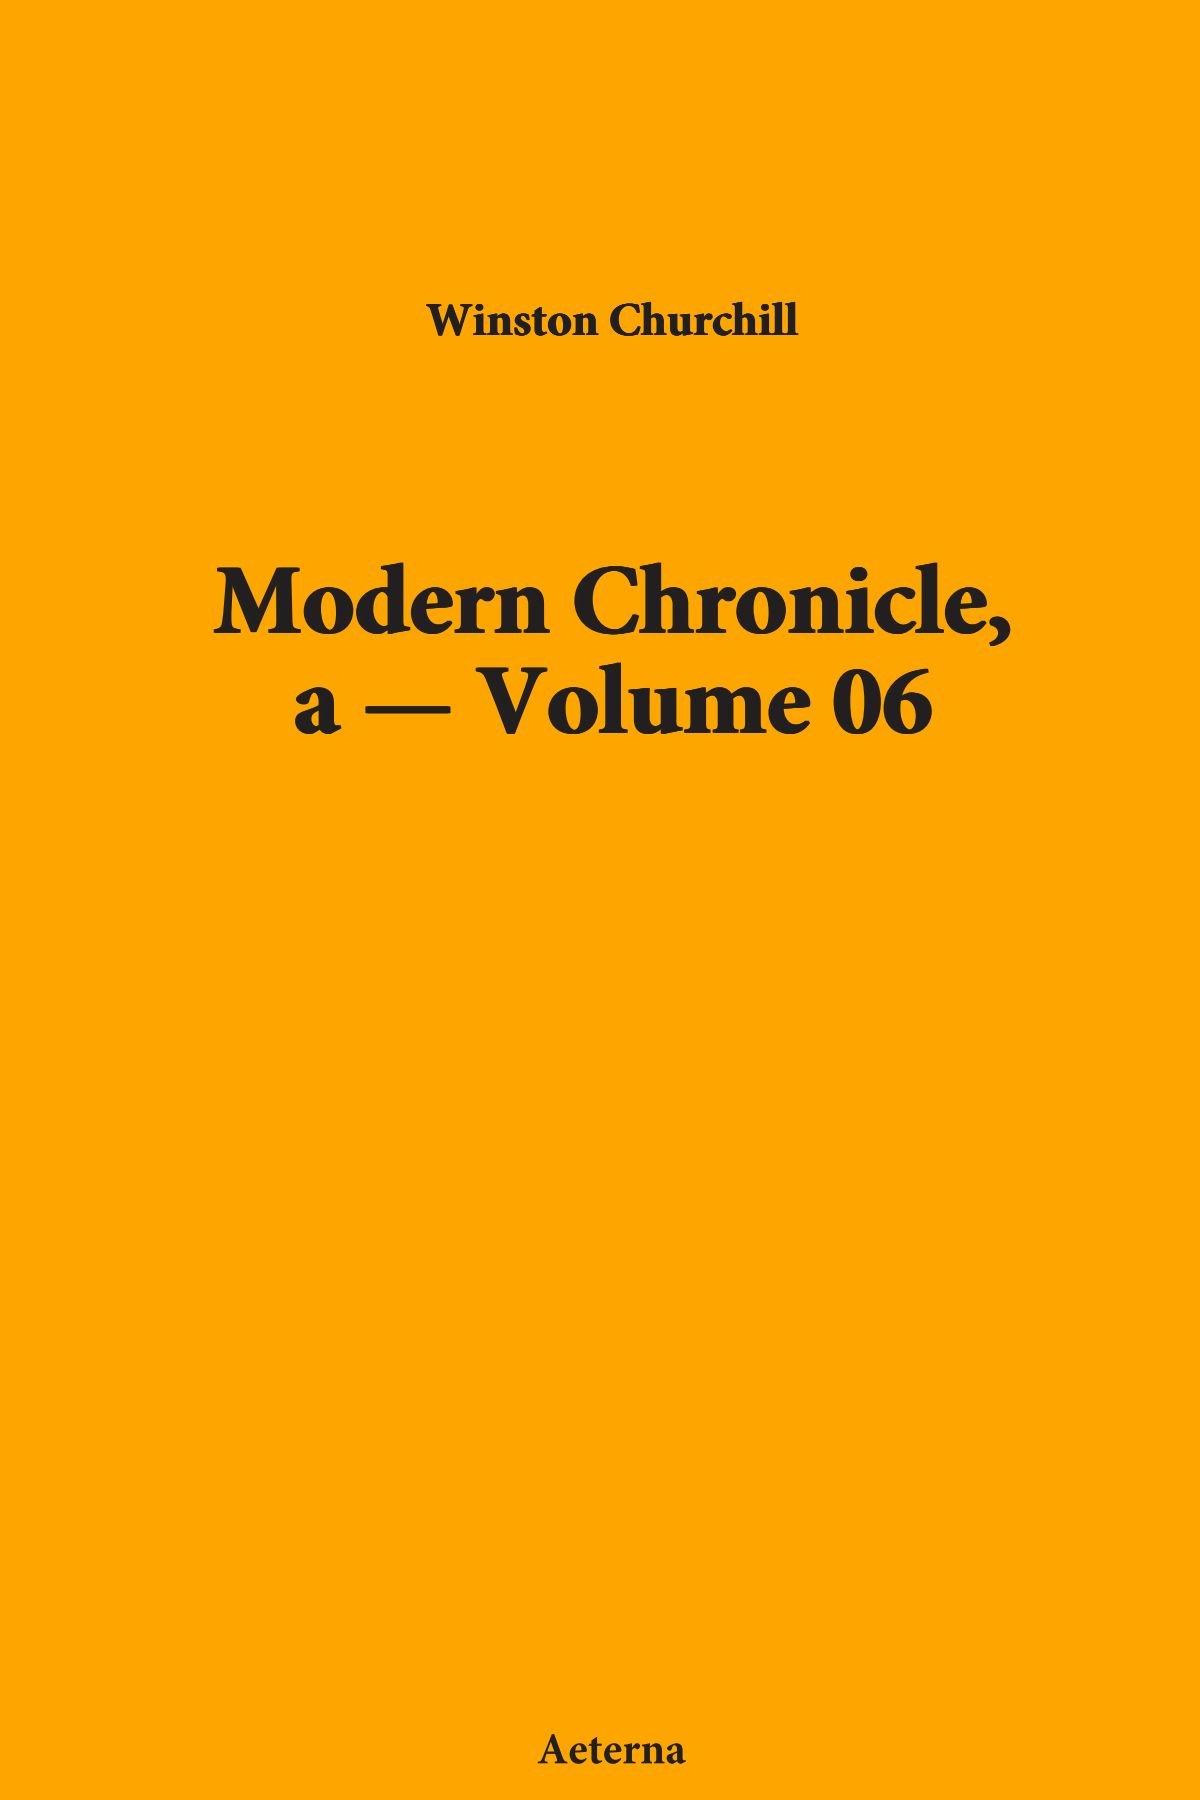 Modern Chronicle, a — Volume 06 PDF